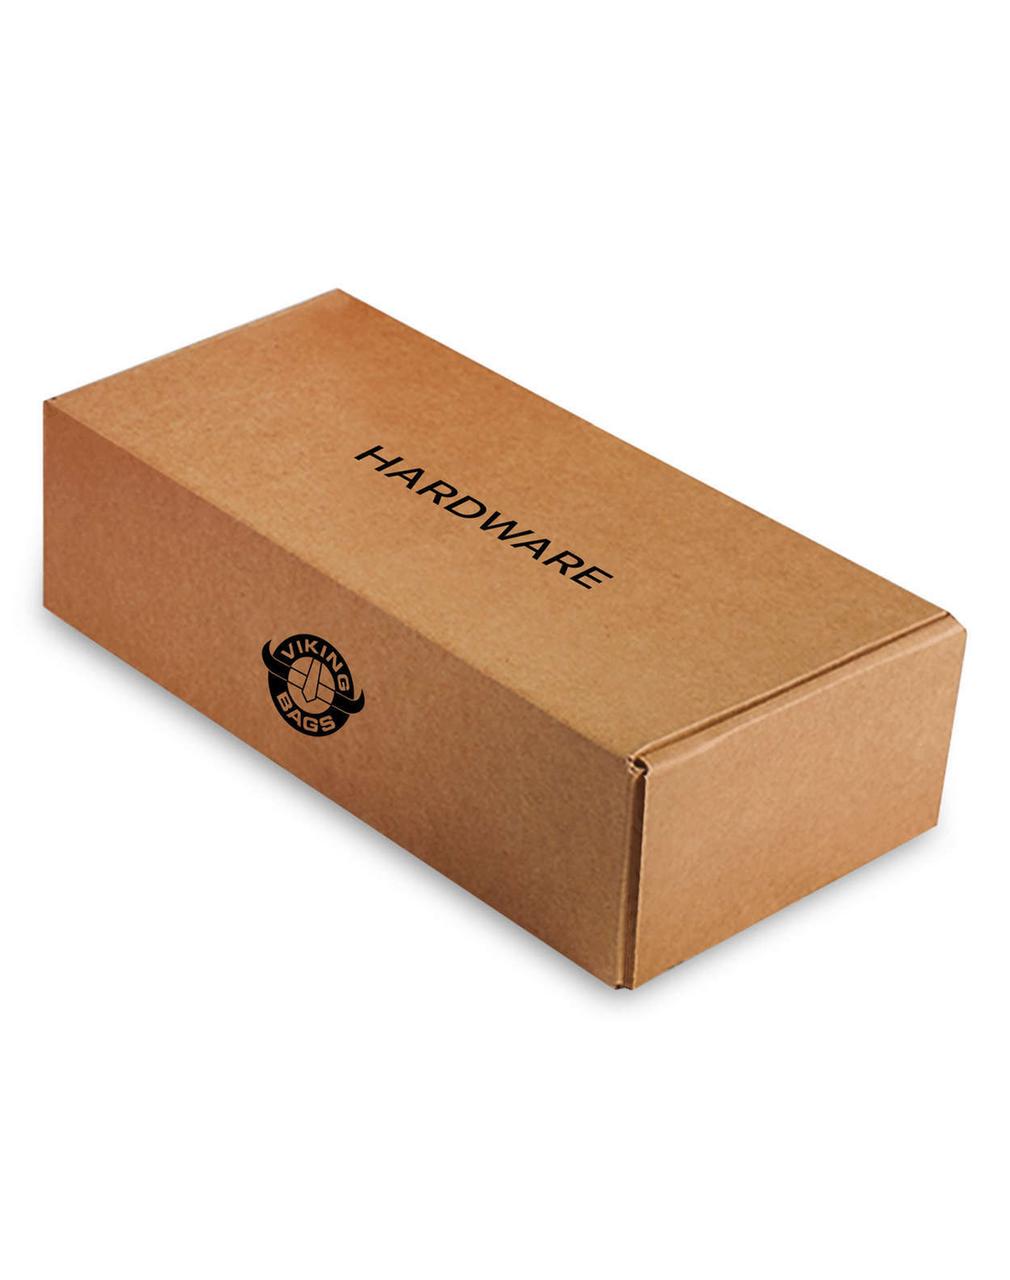 Honda 1500 Valkyrie Interstate Viking Lamellar Leather Covered Shock Cutout Hard Saddlebag Hardware Box